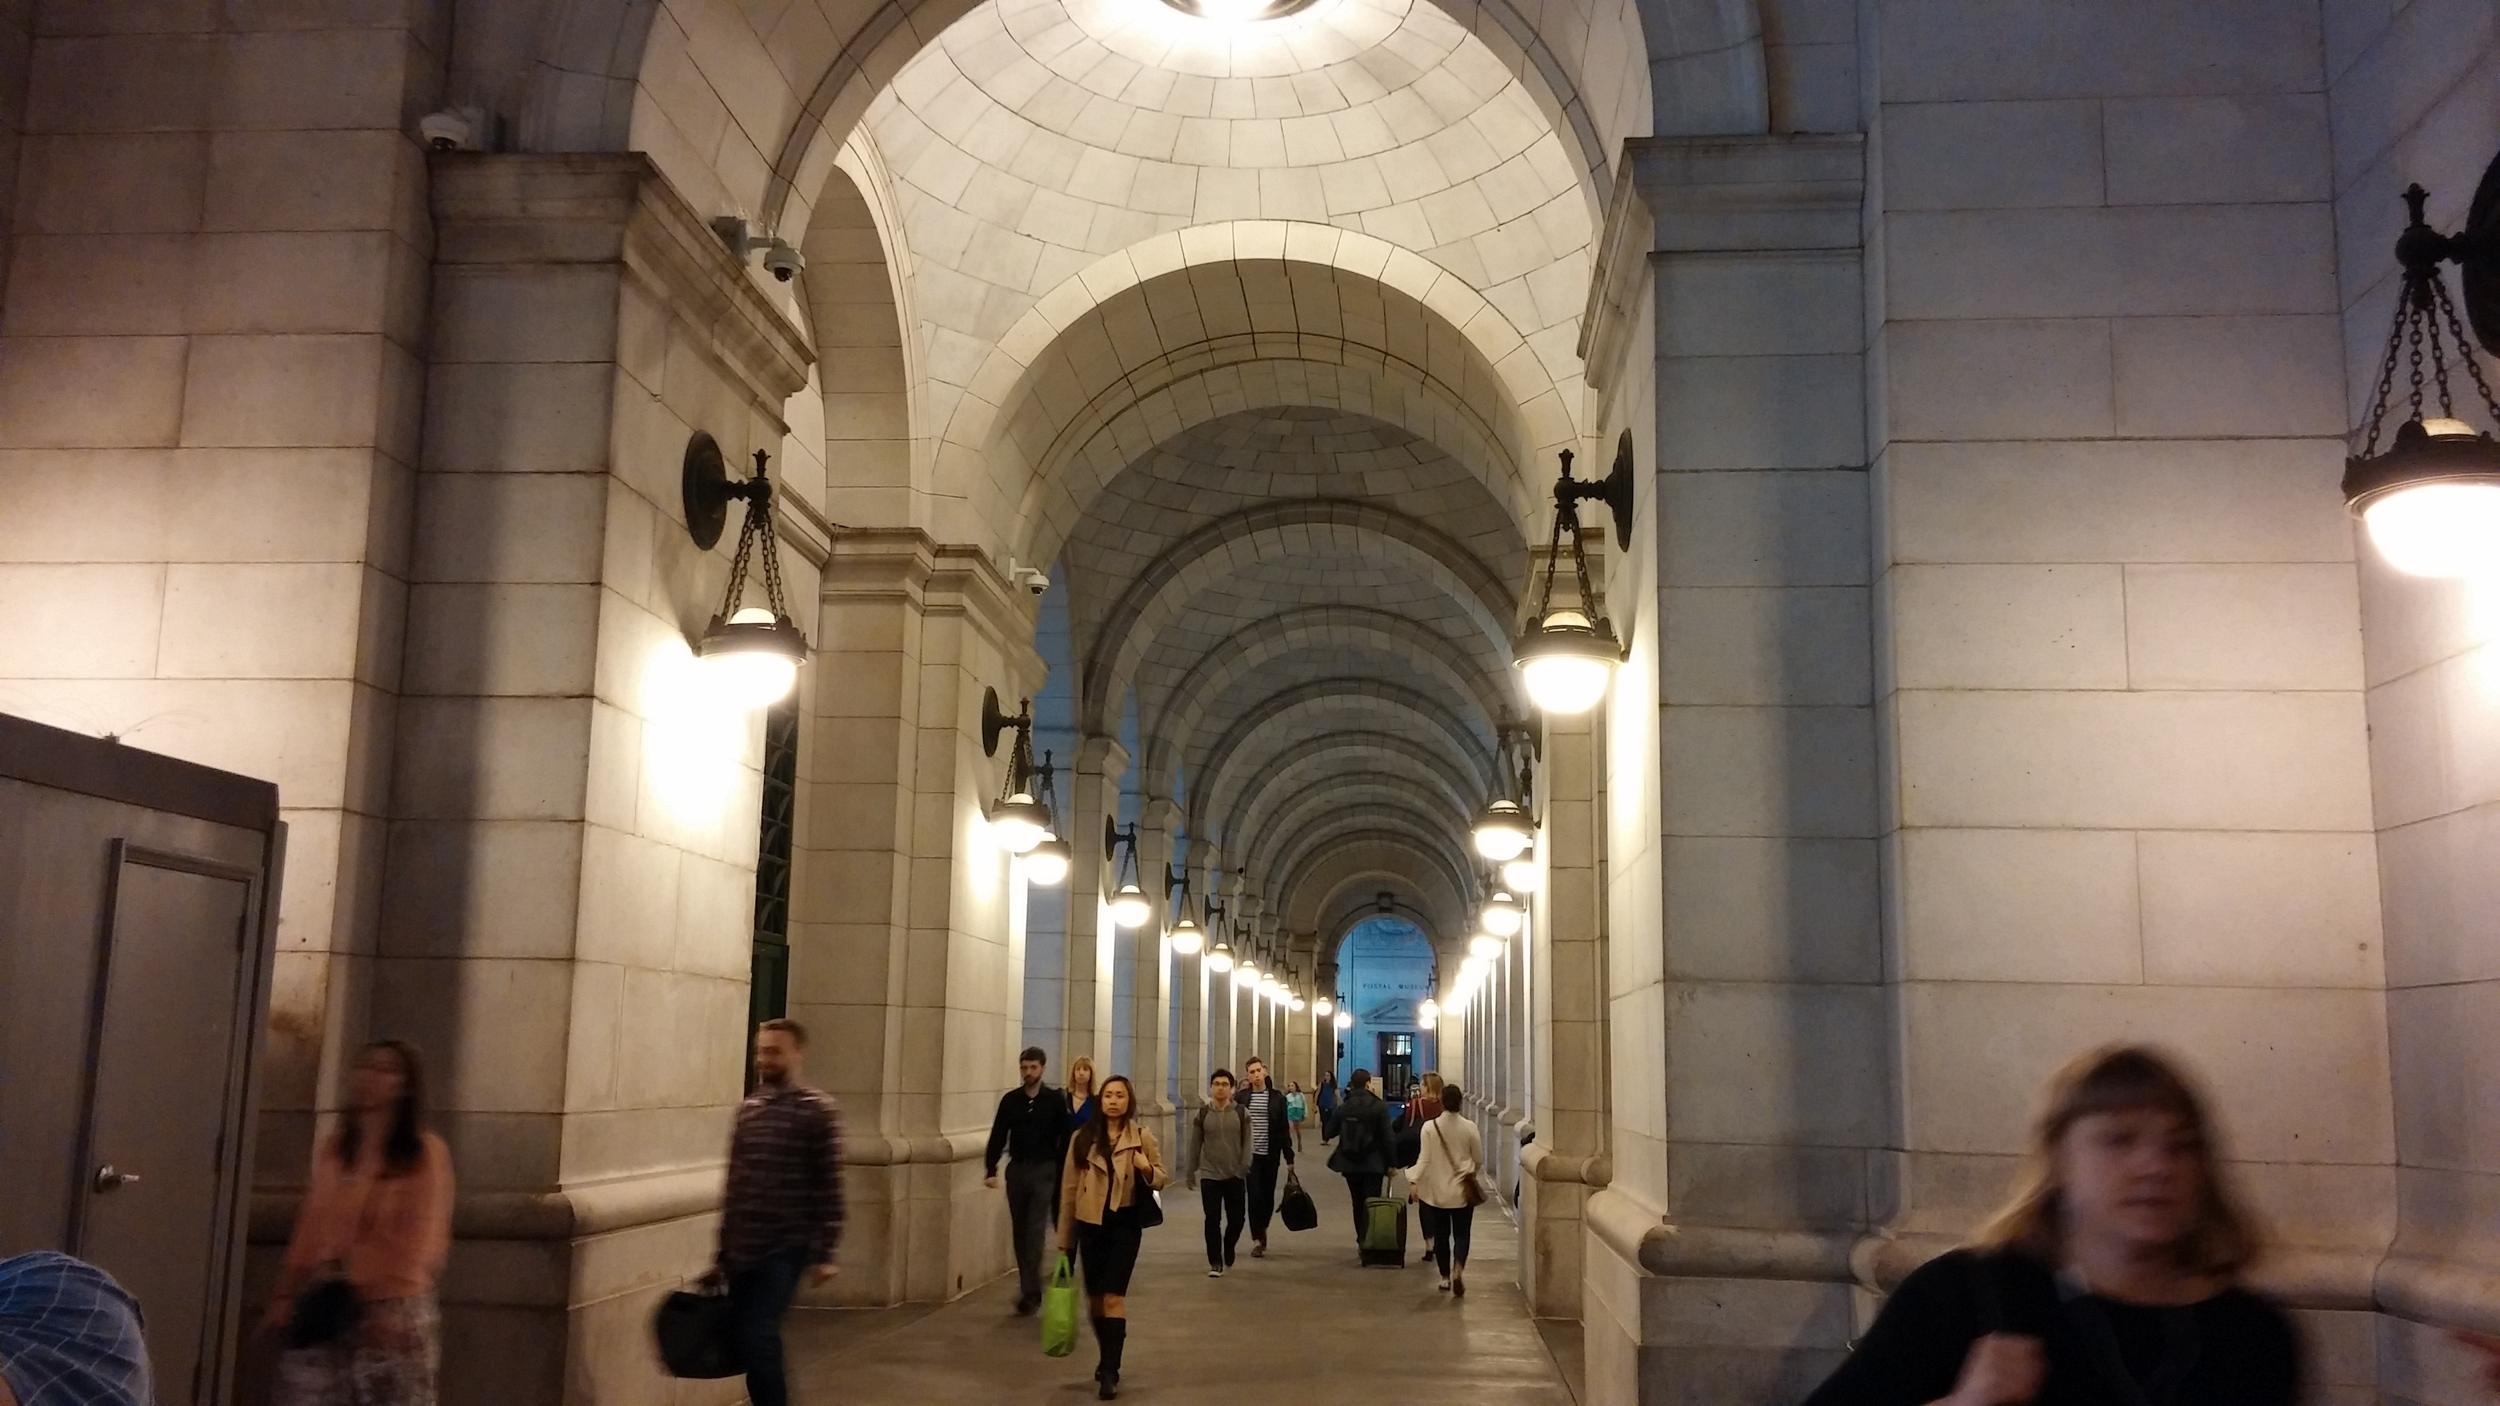 2016-03-11 Union Station in Washington DC 8.jpg